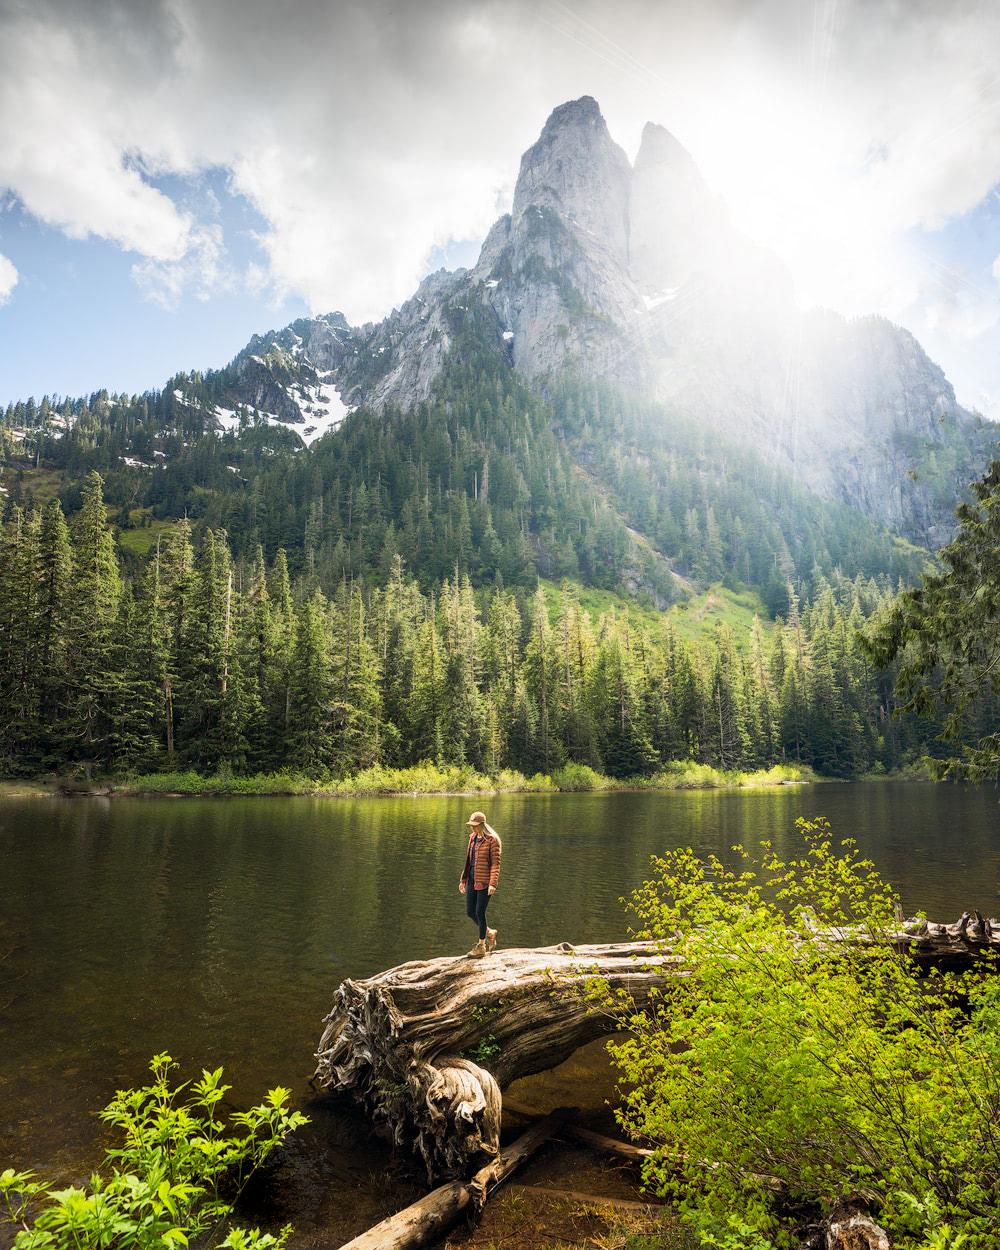 Beginner Friendly Hikes in Washington State - Barclay Lake